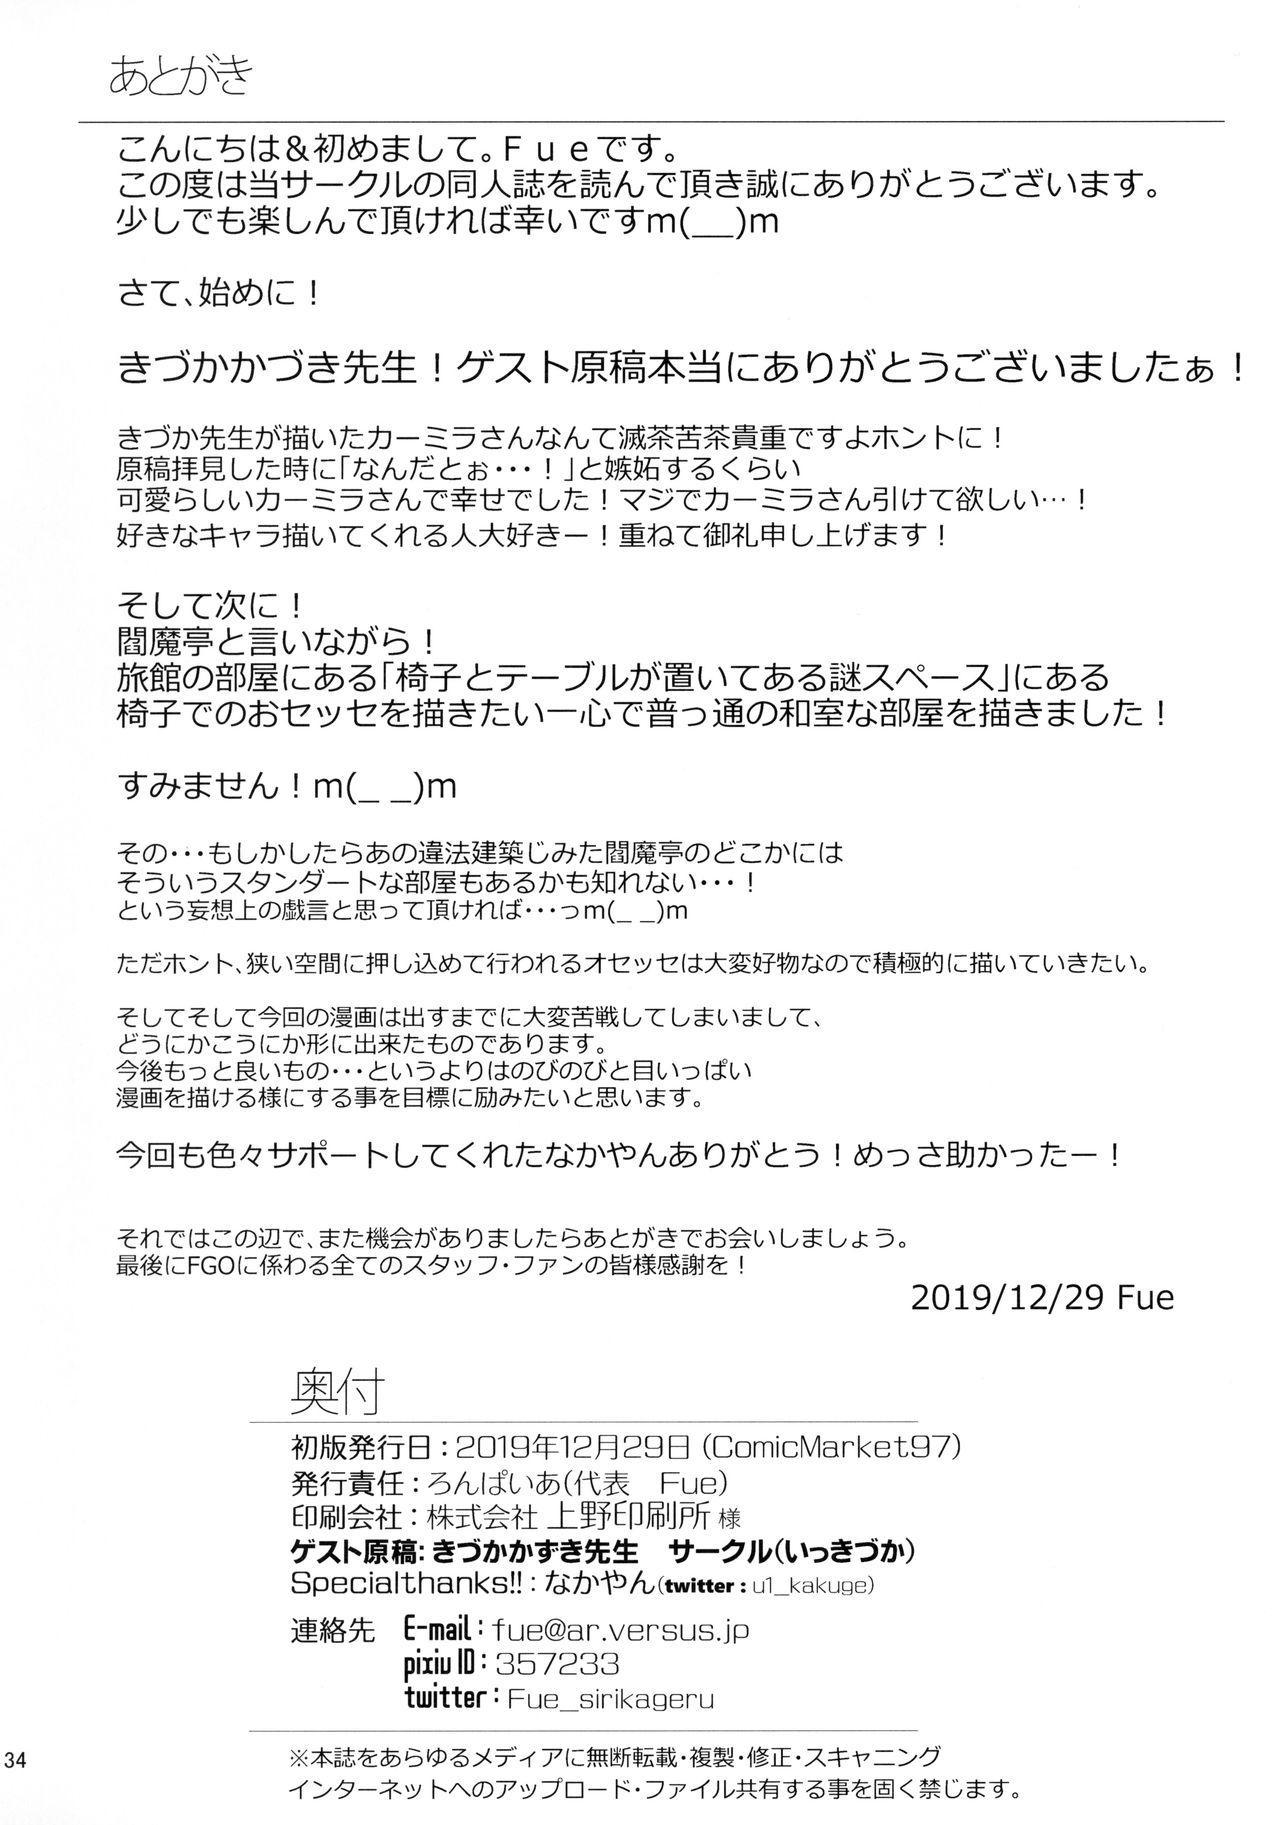 Carmilla-san to Onsen Ryokan de Shita Koto no Zenbu. | Everything I Did With Carmilla At The Hot Spring. 32